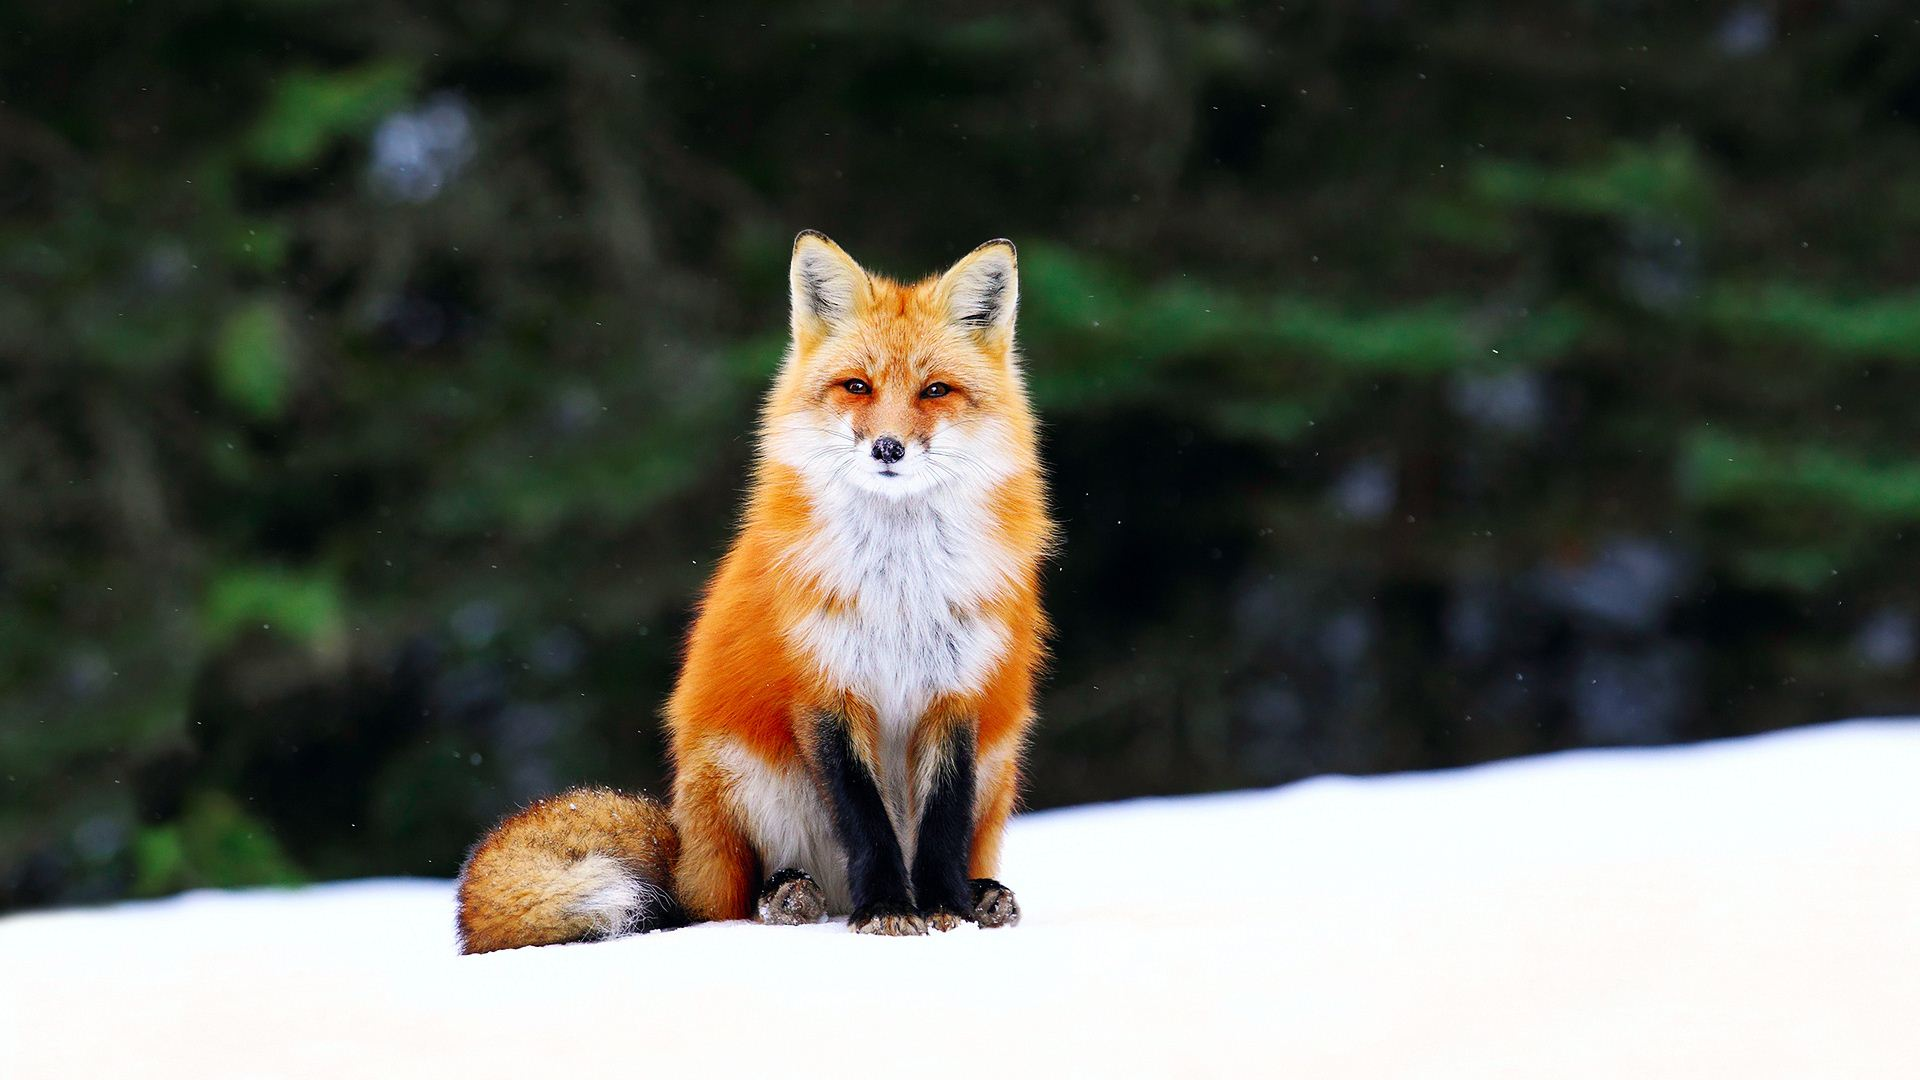 Cute Orange Fox Res: 1920x1080 HD / Size:162kb. Views: 29061